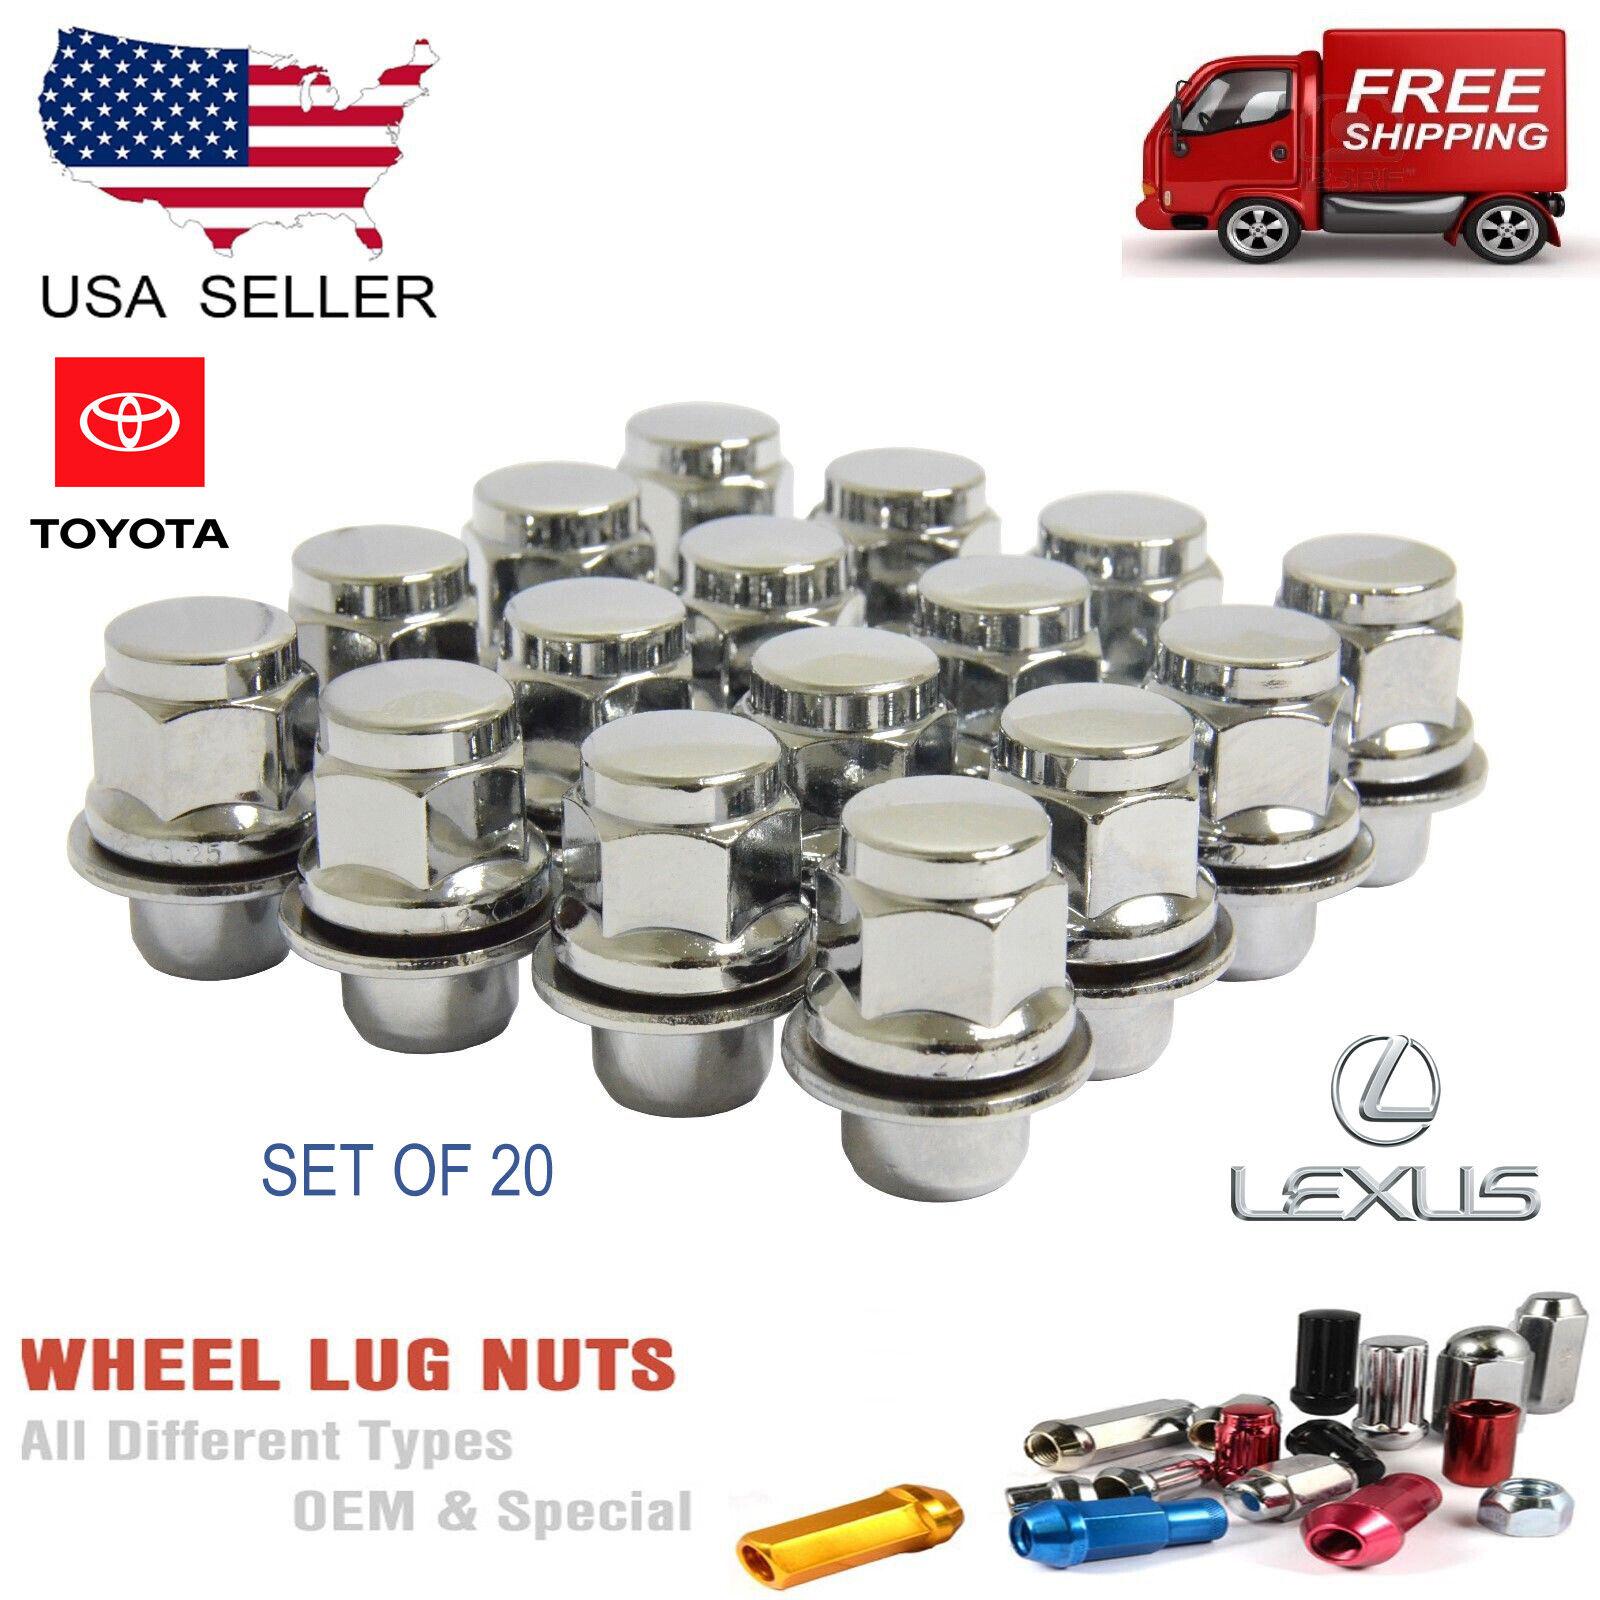 24 Gorilla Chrome Bulge Acorn Lug Nuts 12X1.5Fits Lexus Scion Toyota Wheels